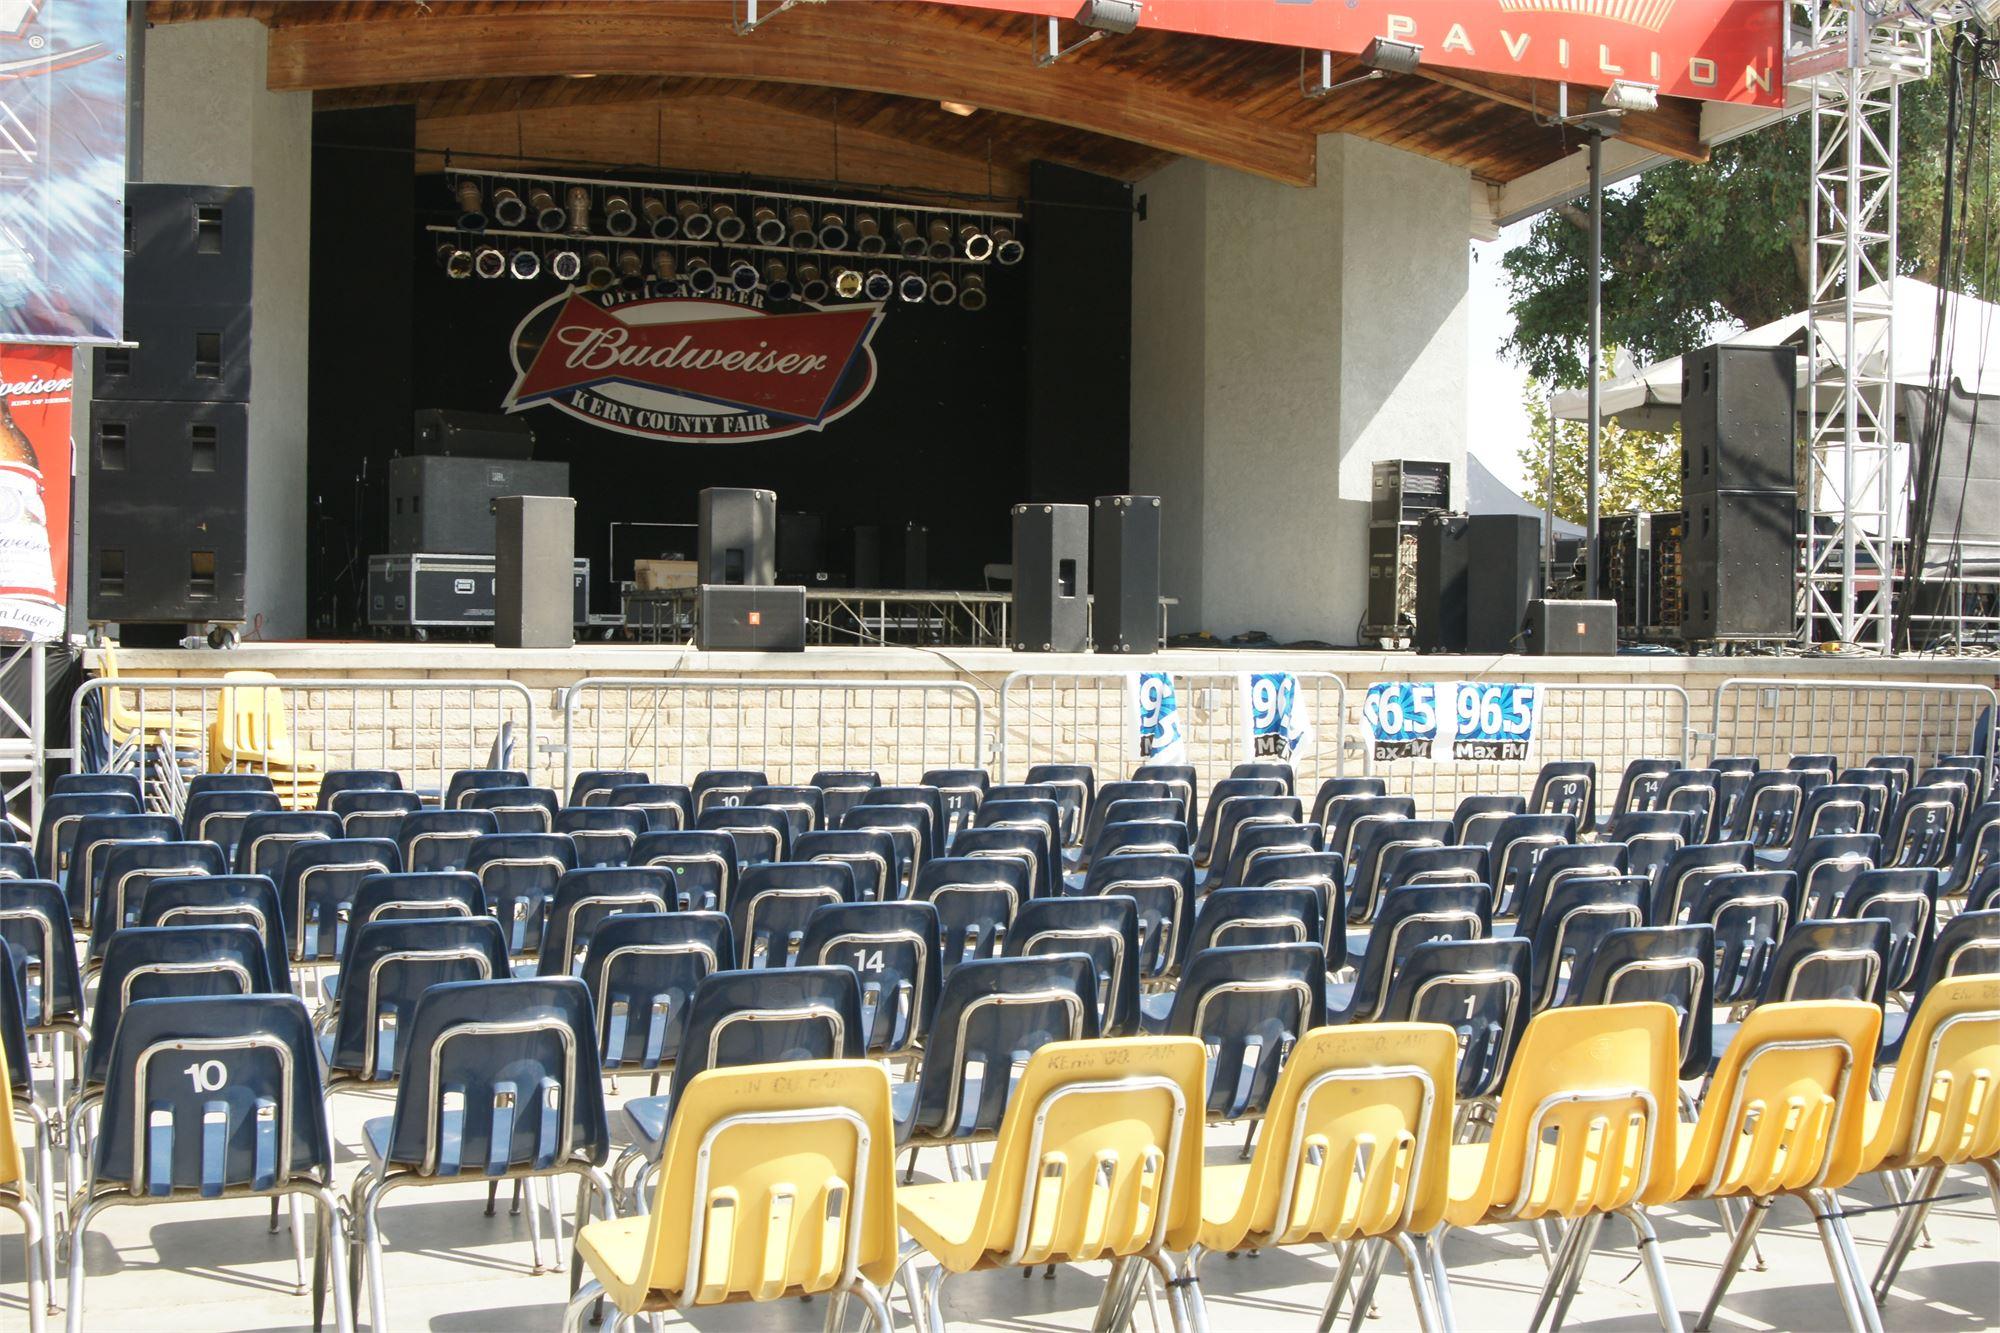 Budweiser Pavilion